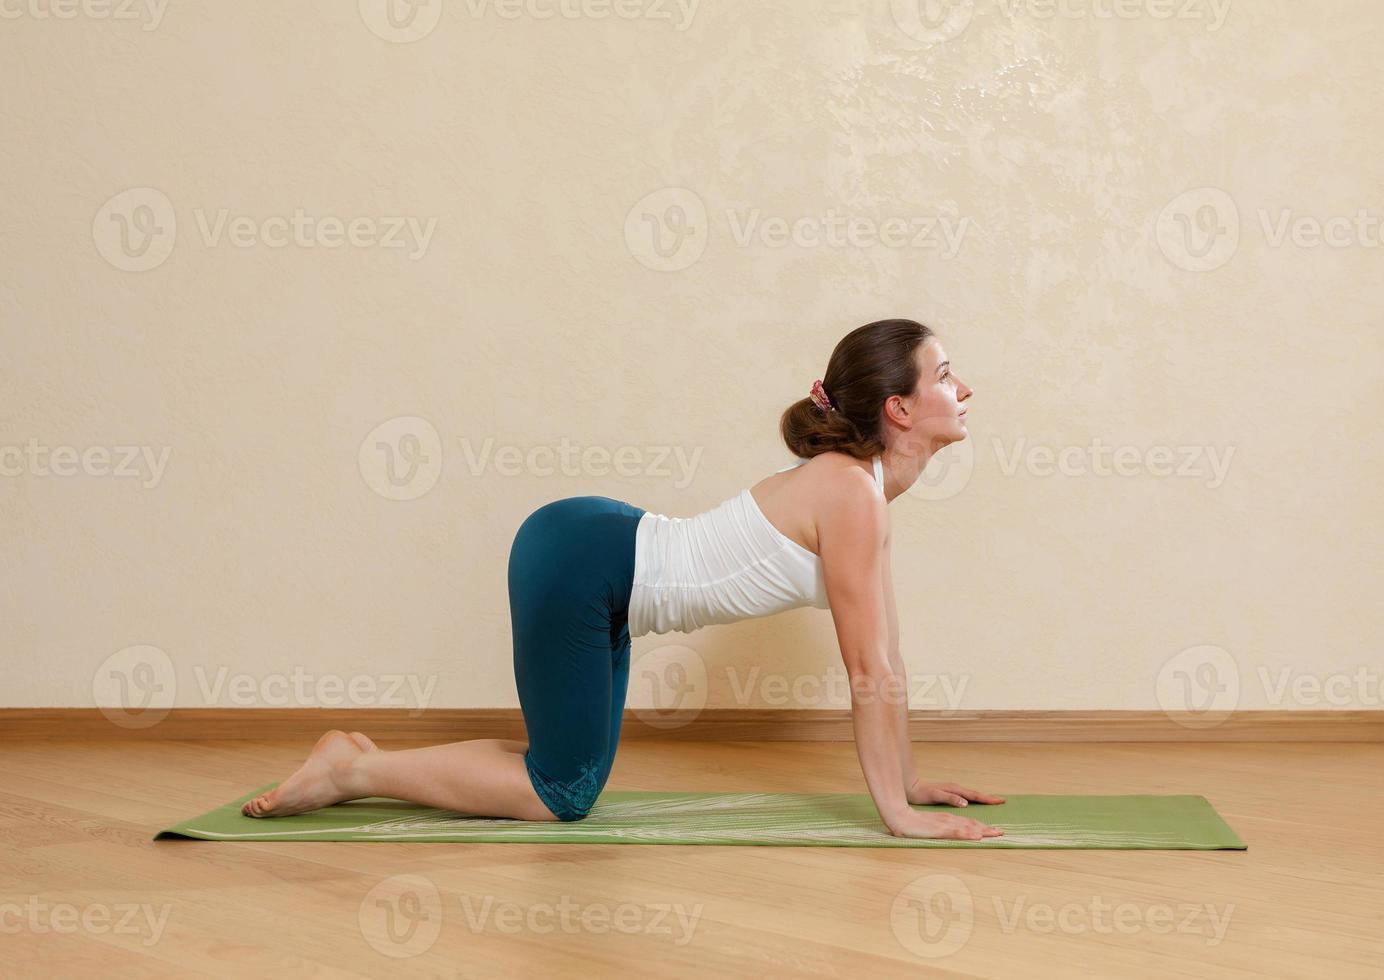 femme caucasienne pratique le yoga au studio (bidalasana) photo